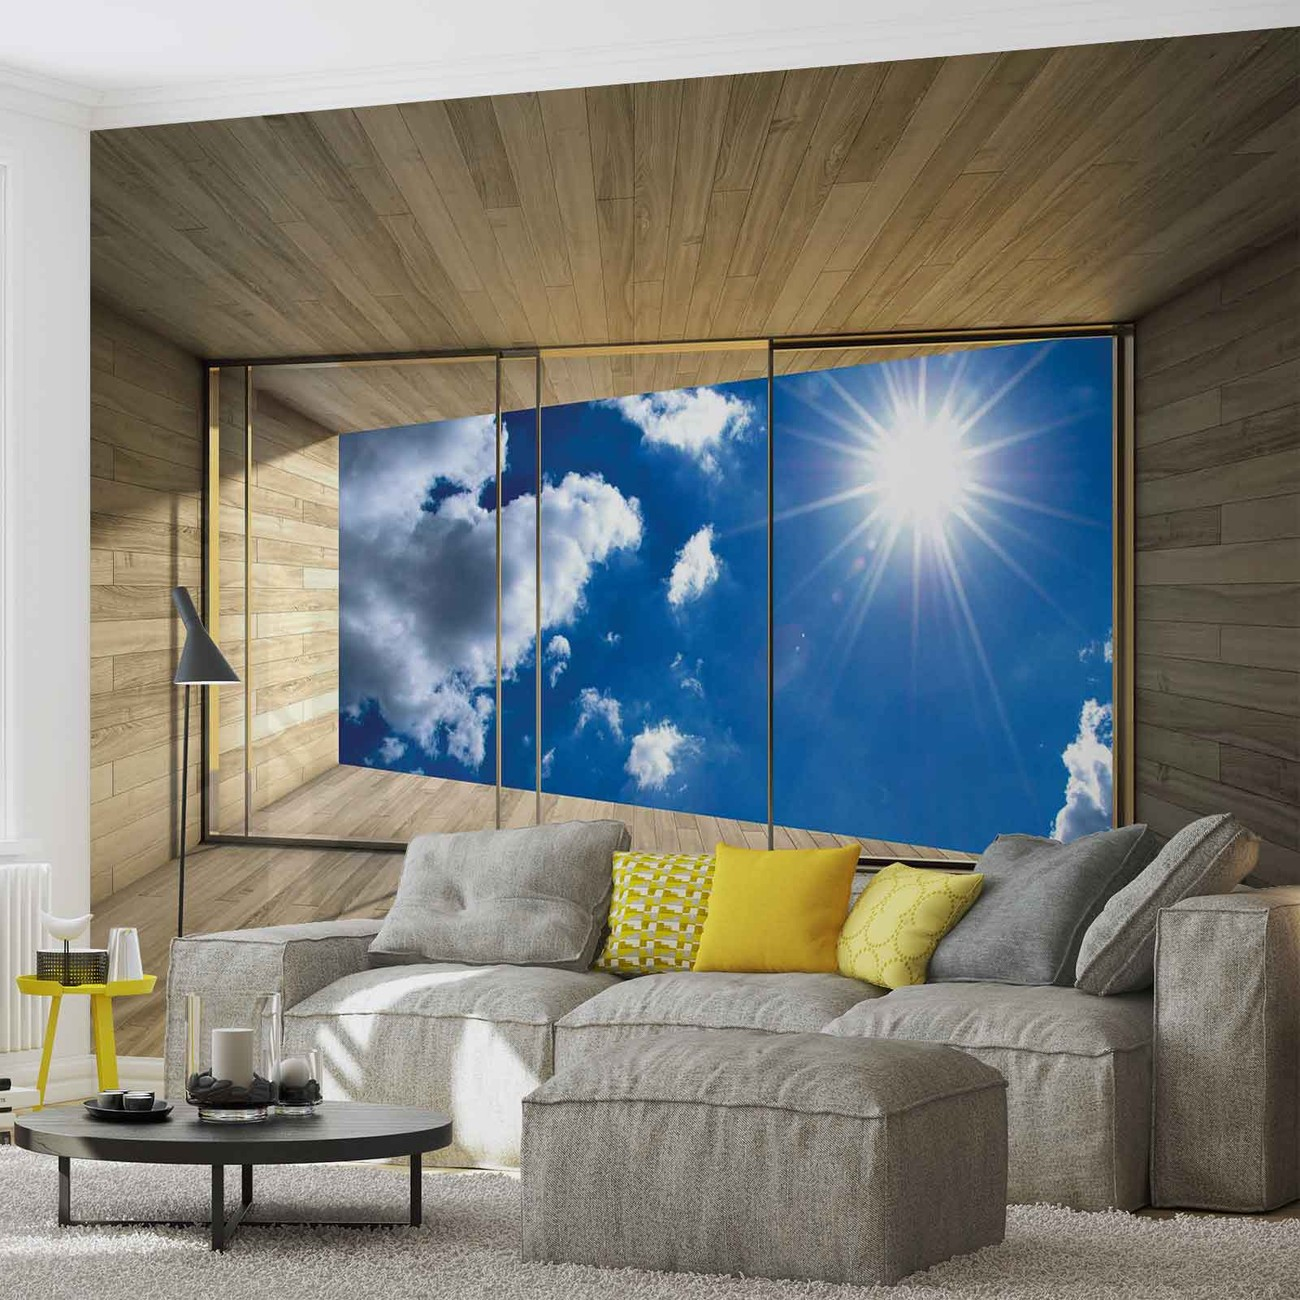 fototapete tapete fenster himmel wolken sonne natur bei. Black Bedroom Furniture Sets. Home Design Ideas